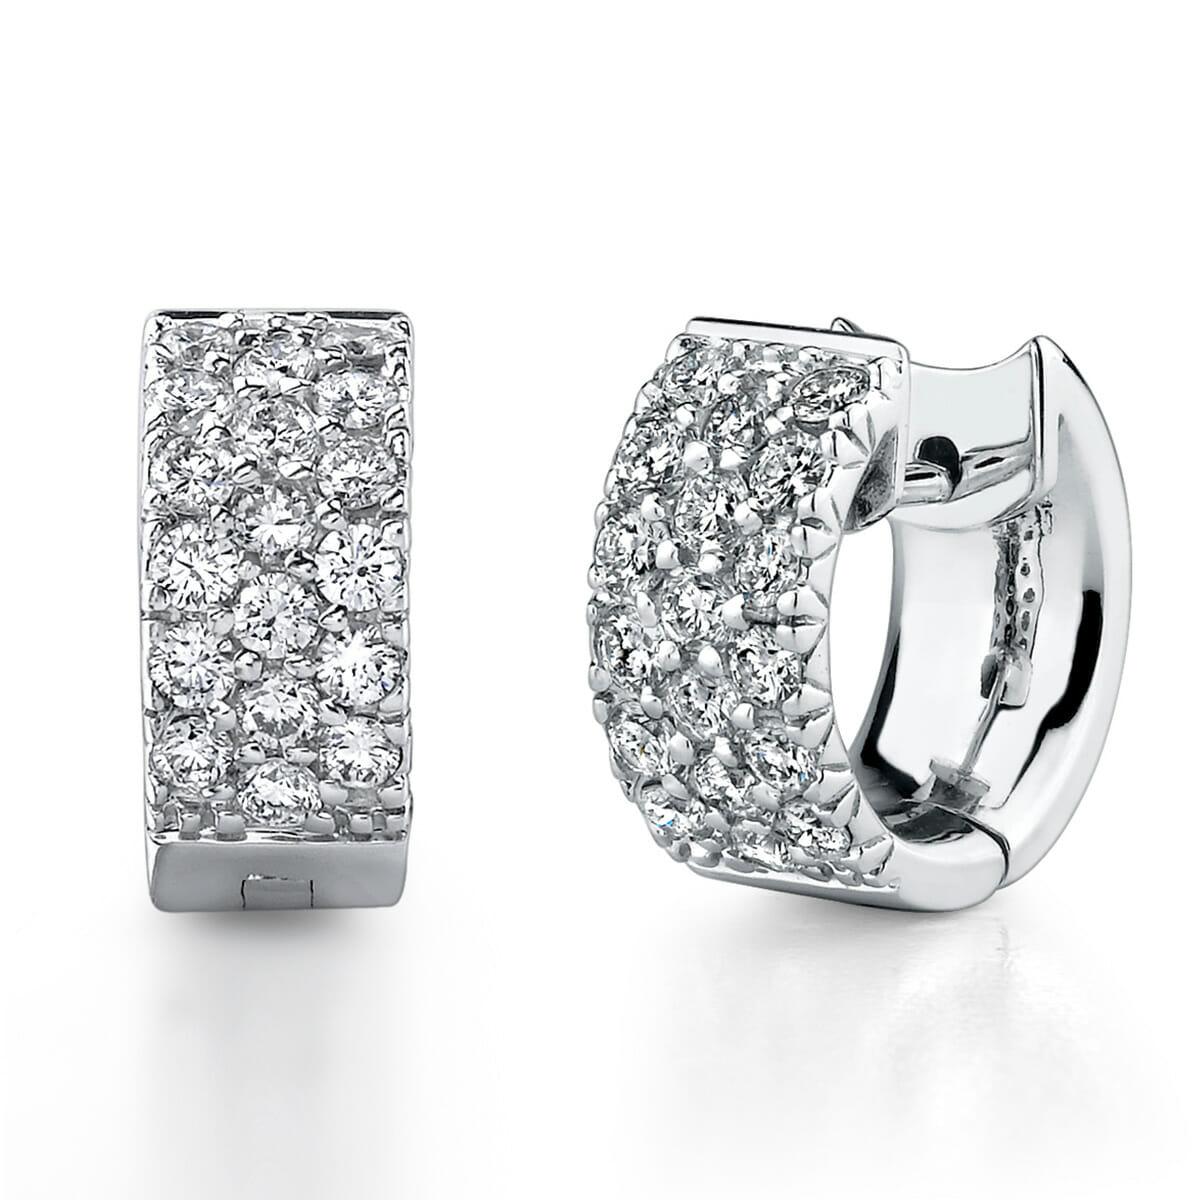 Diamond Hoop Earrings The Guys Collection